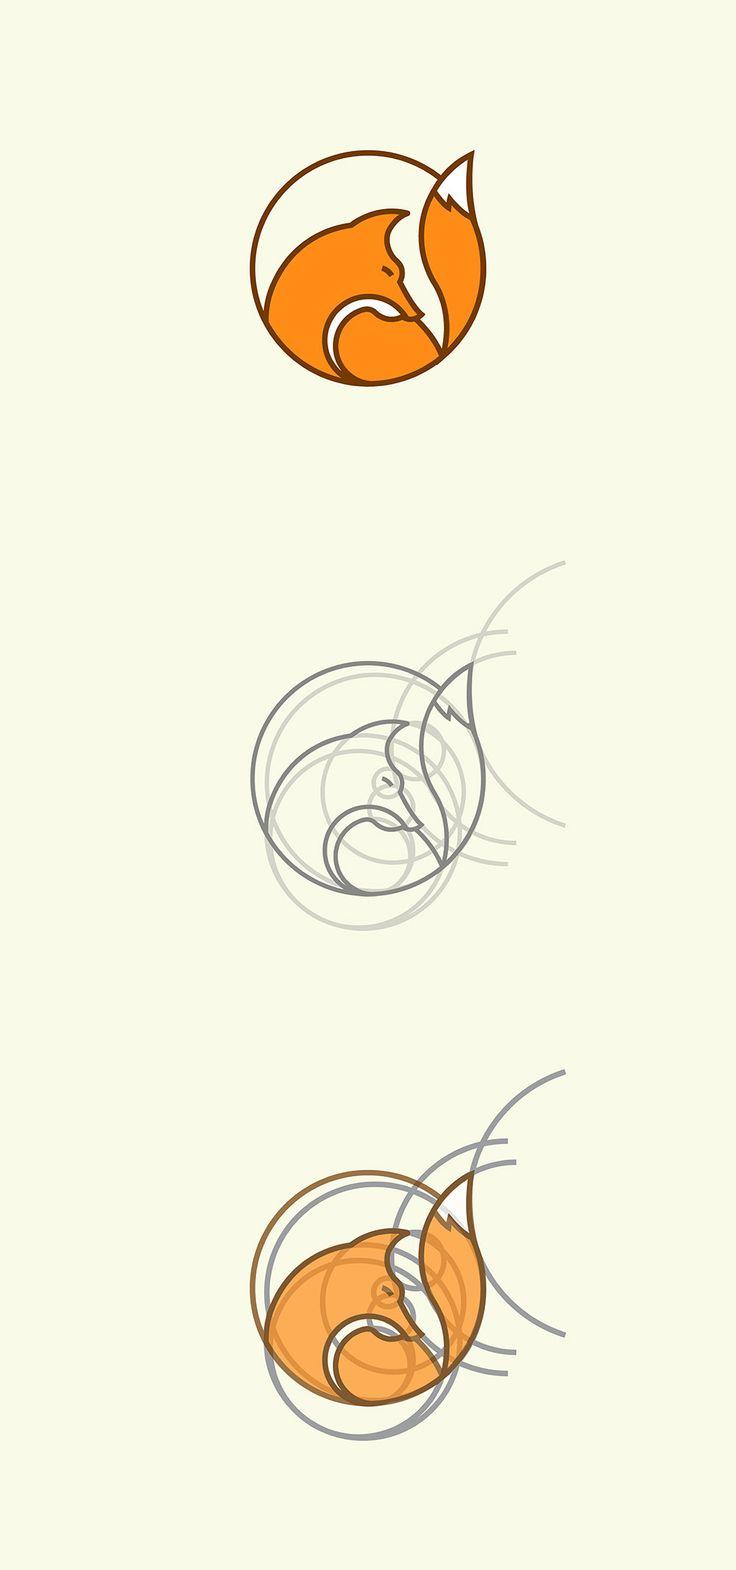 Fox logo construction by Rene Agudelo | Check out more of his work on behance.net/rene_agudelo